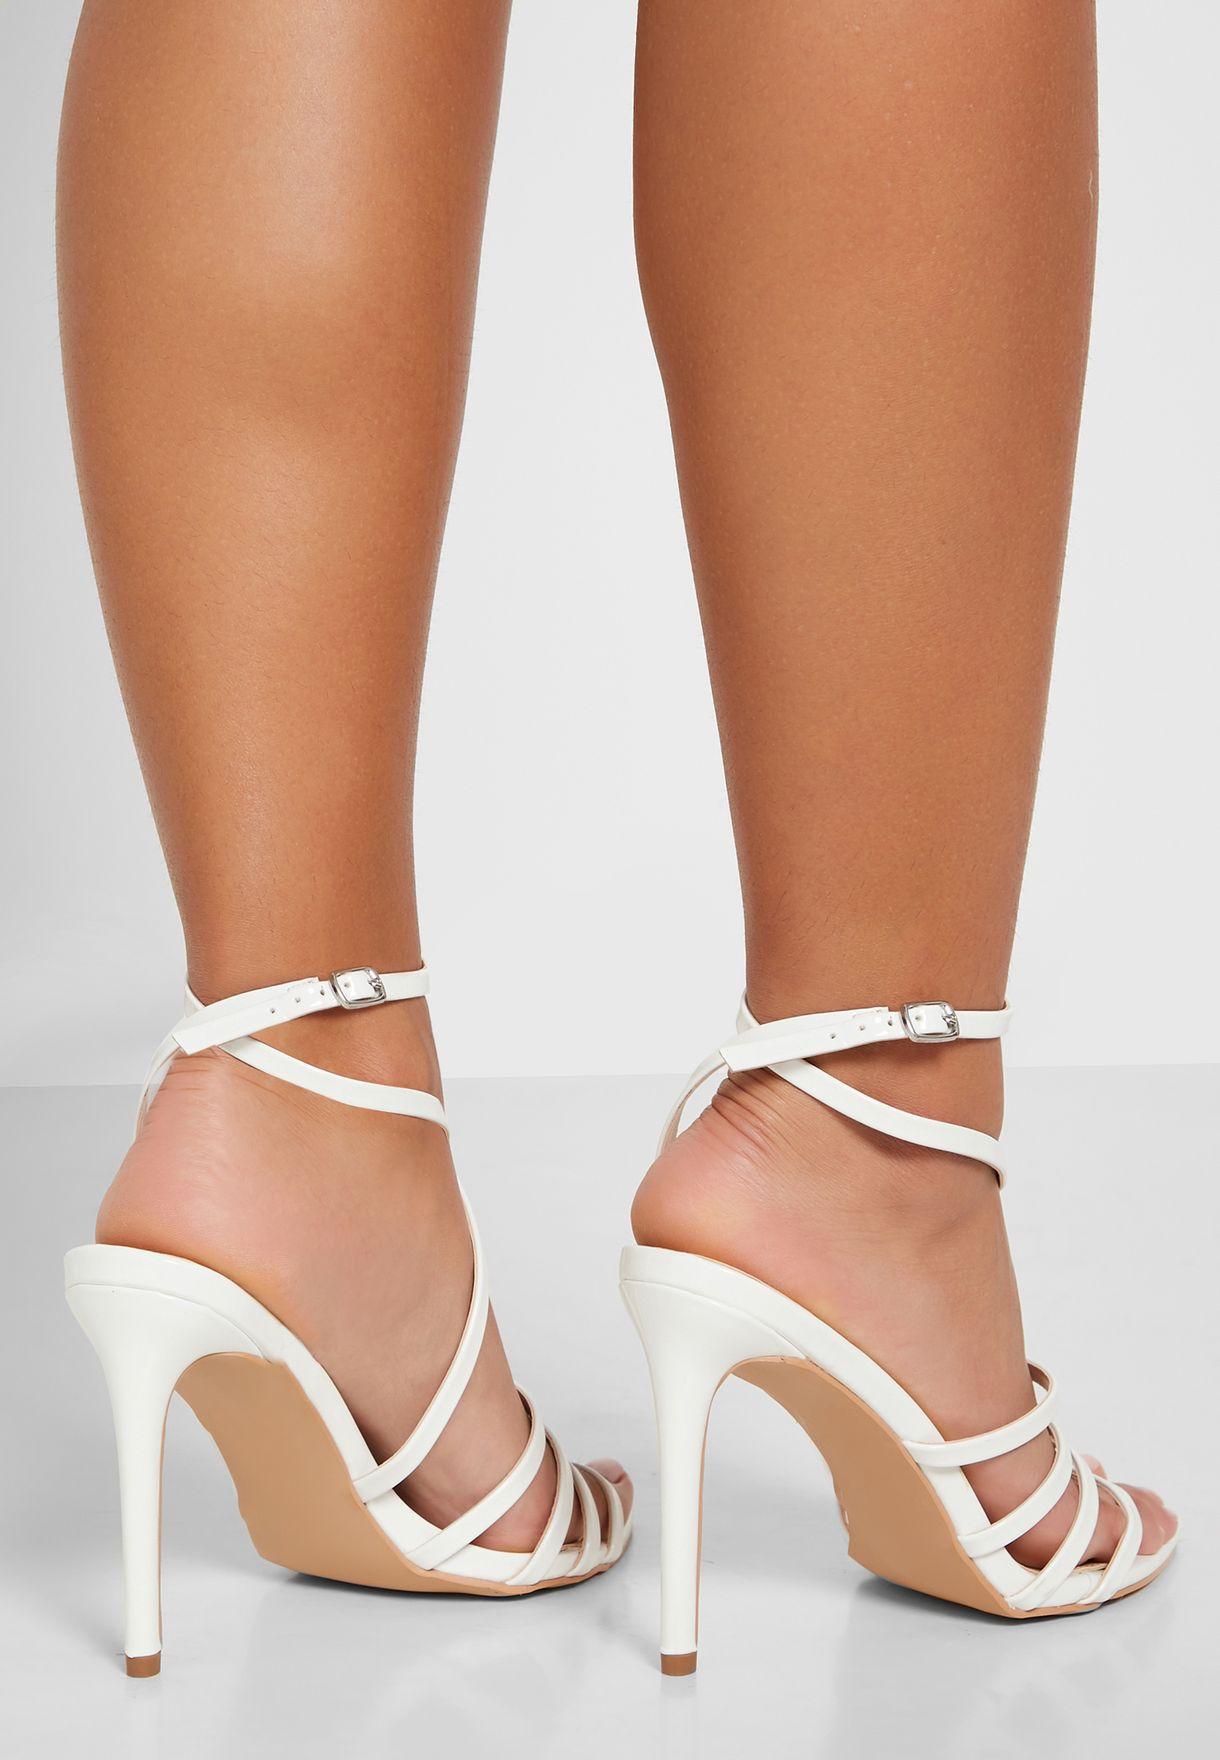 Multi-Strap Pointed Toe Stiletto Sandal